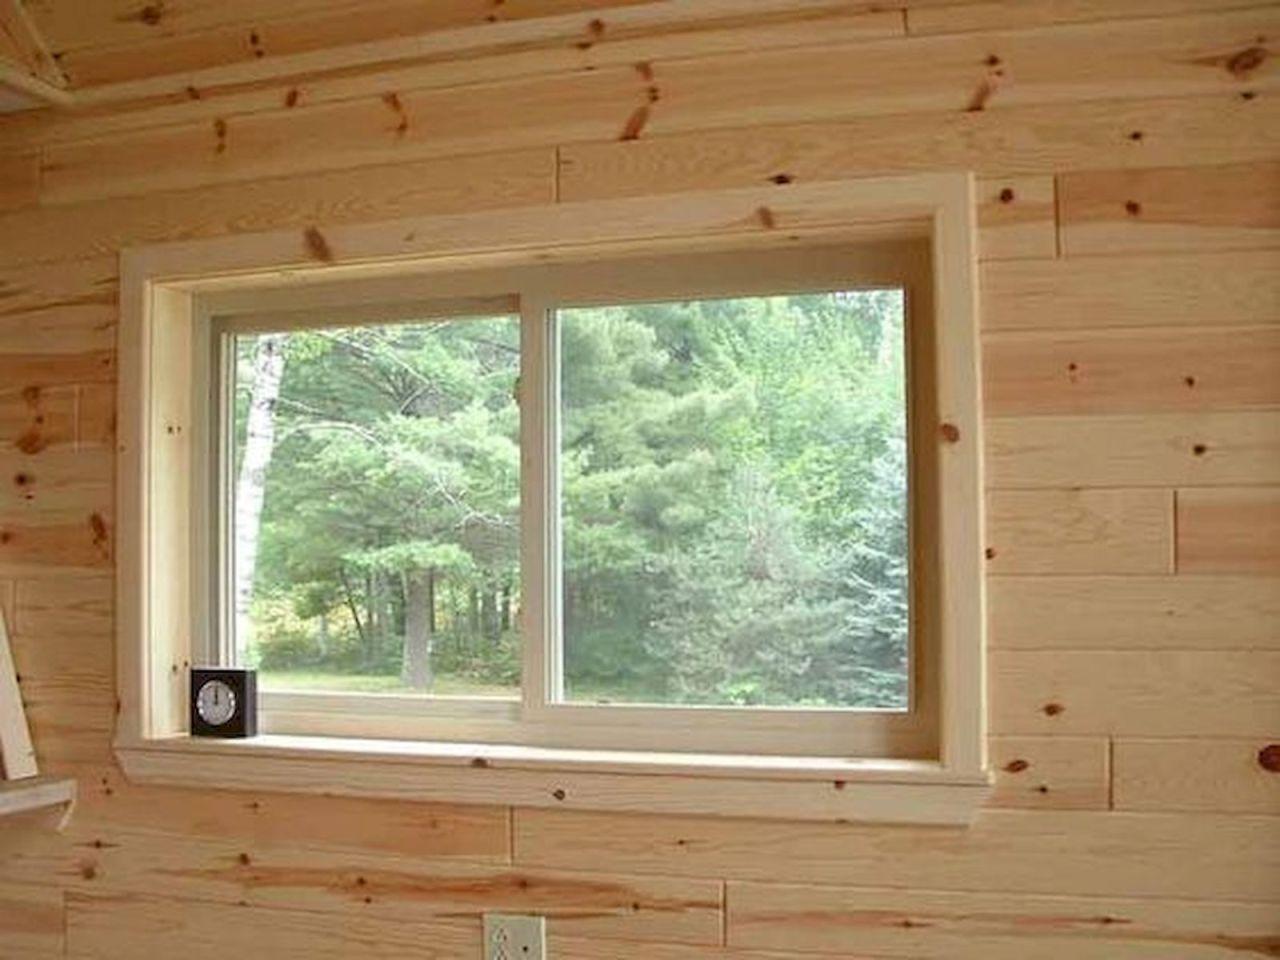 43 Favorite Window Trim Interior Design Ideas 15 Ideaboz Pine Trim Rustic Window Knotty Pine Paneling